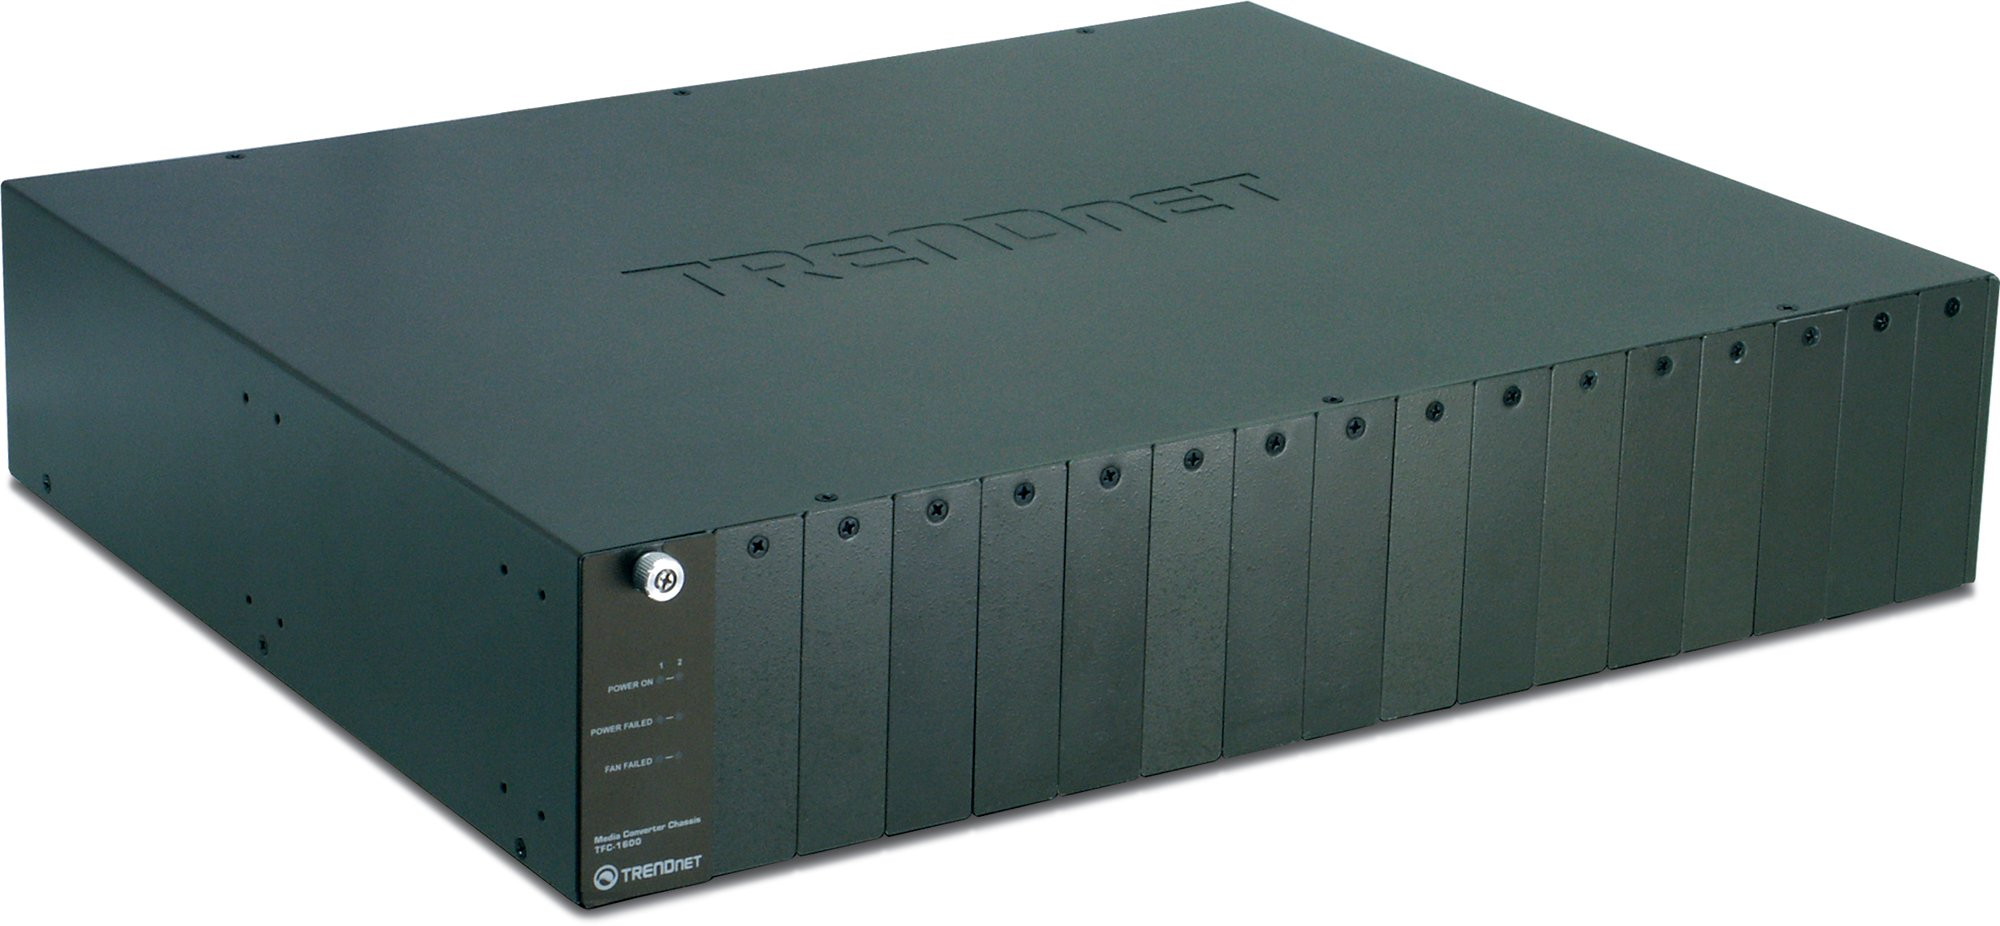 TRENDnet 16-Bay Fiber Converter Chassis System SNMP Management Module, TFC-1600 by TRENDnet